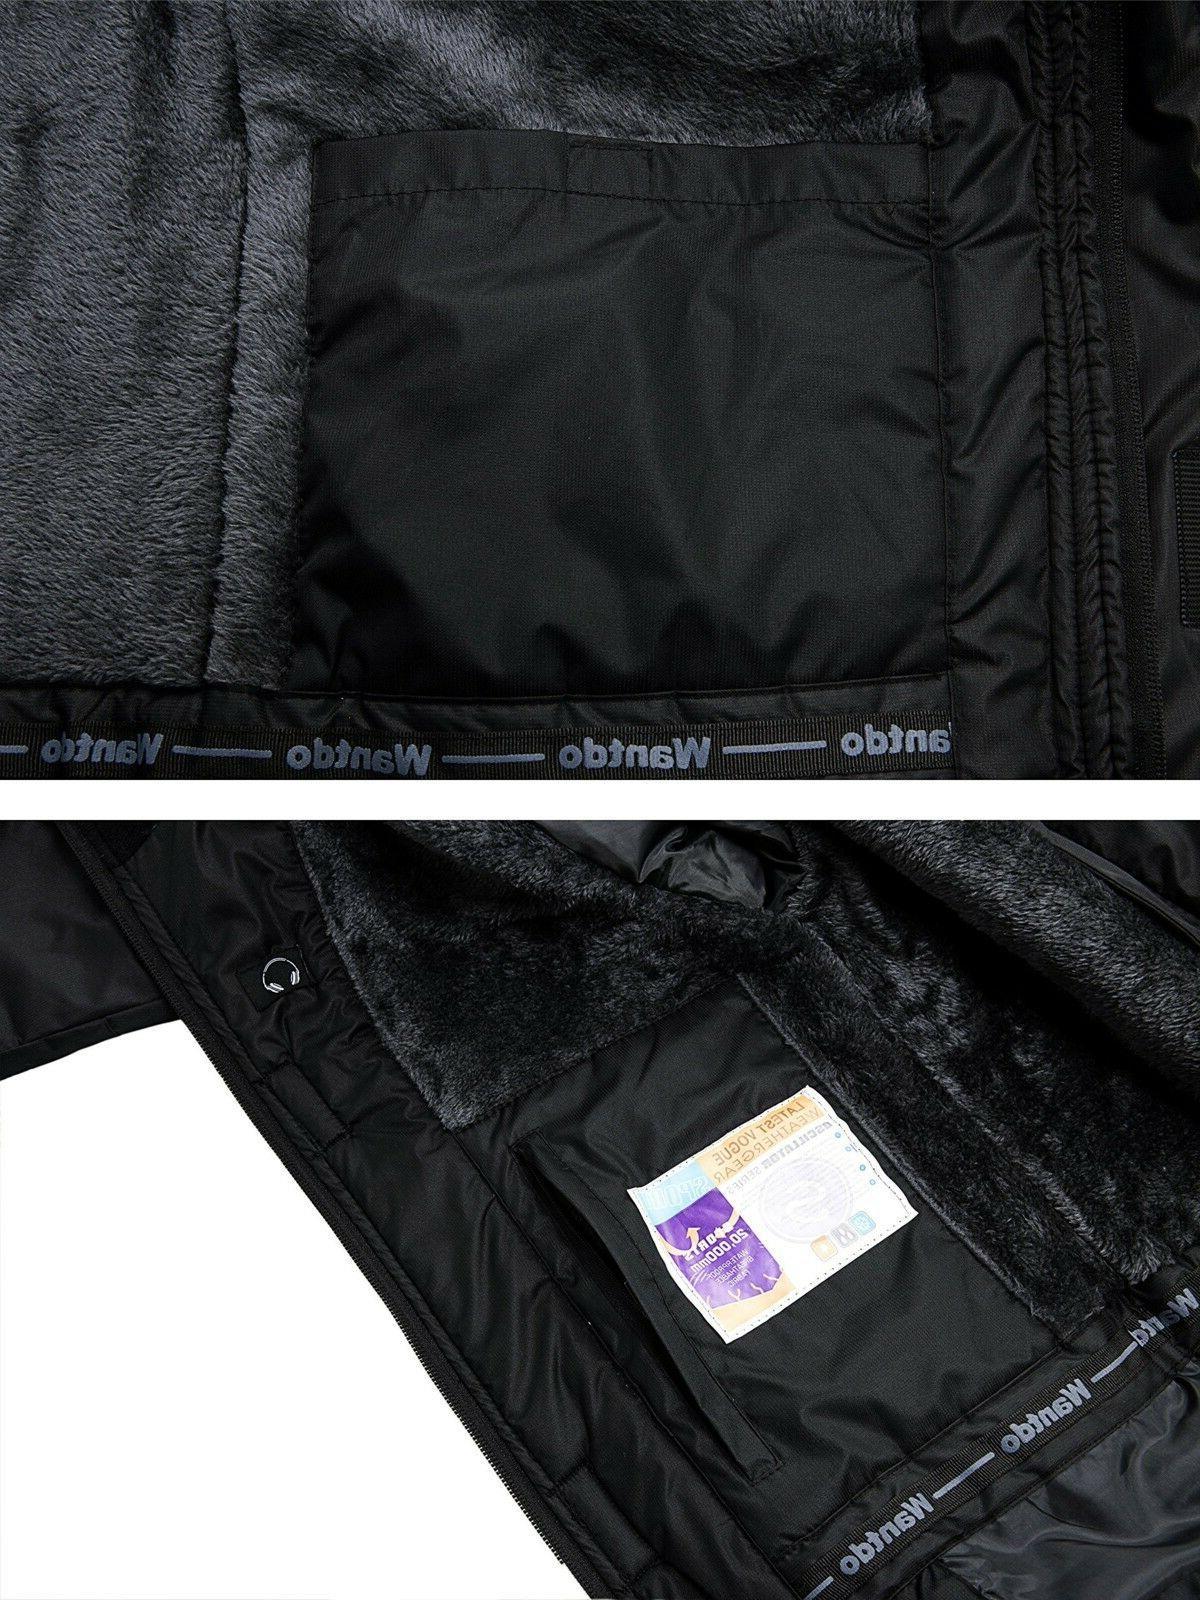 Wantdo Jacket Fleece Windproof Ski Jacket M Black M